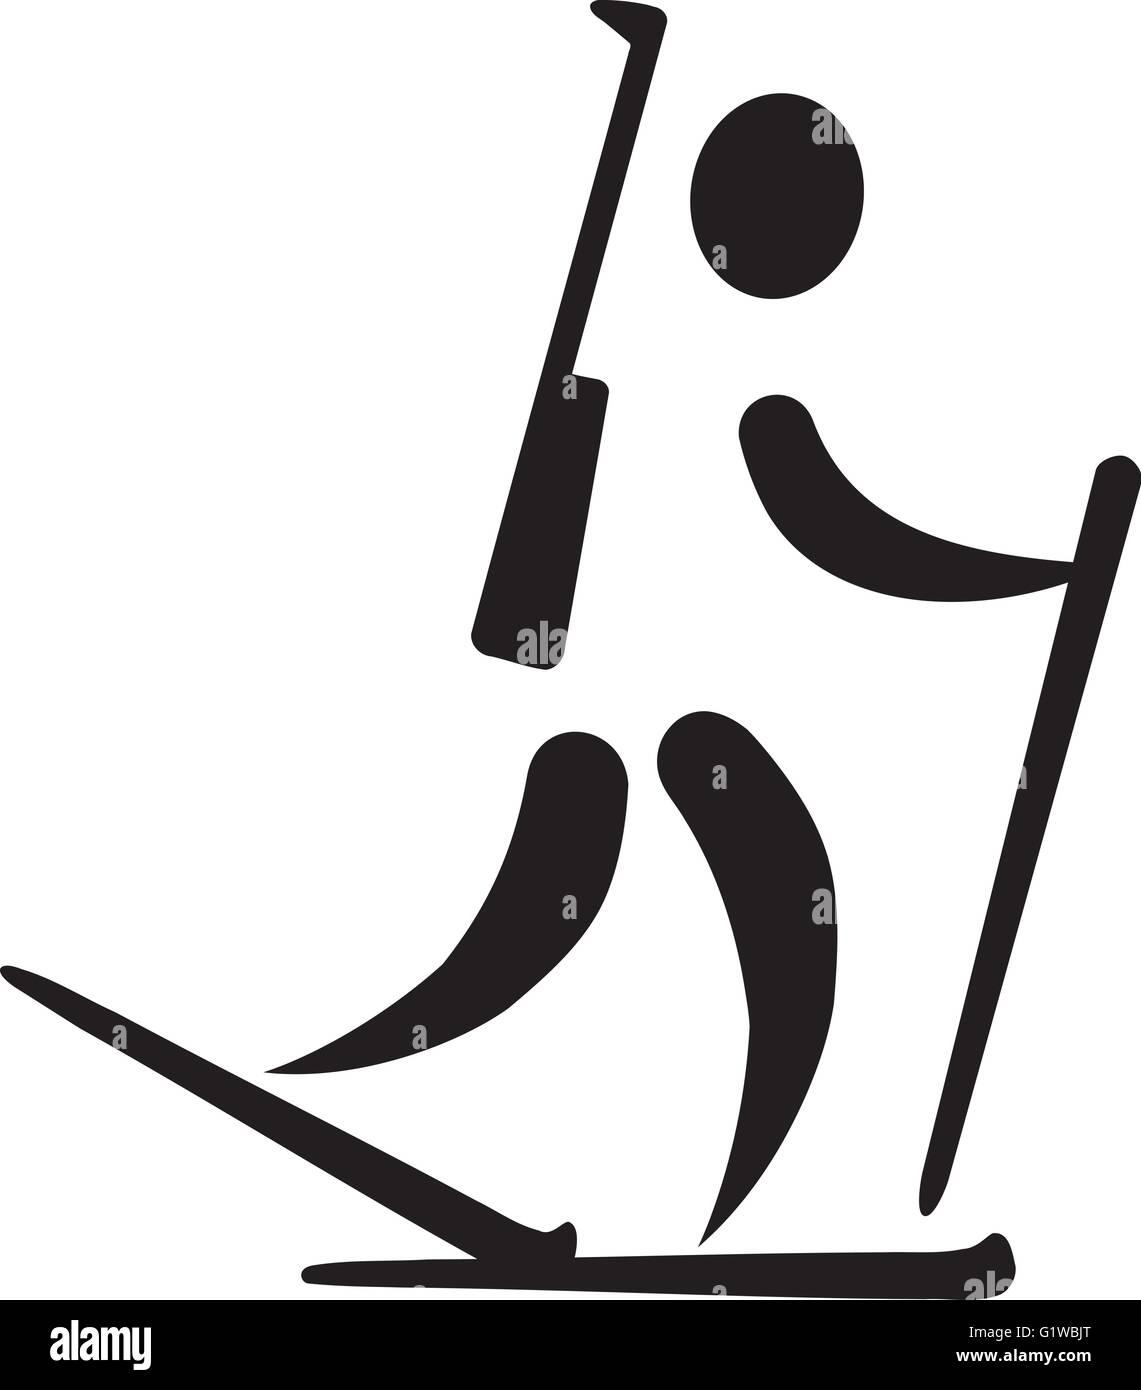 Biathlon Runnin Pictogram - Stock Vector